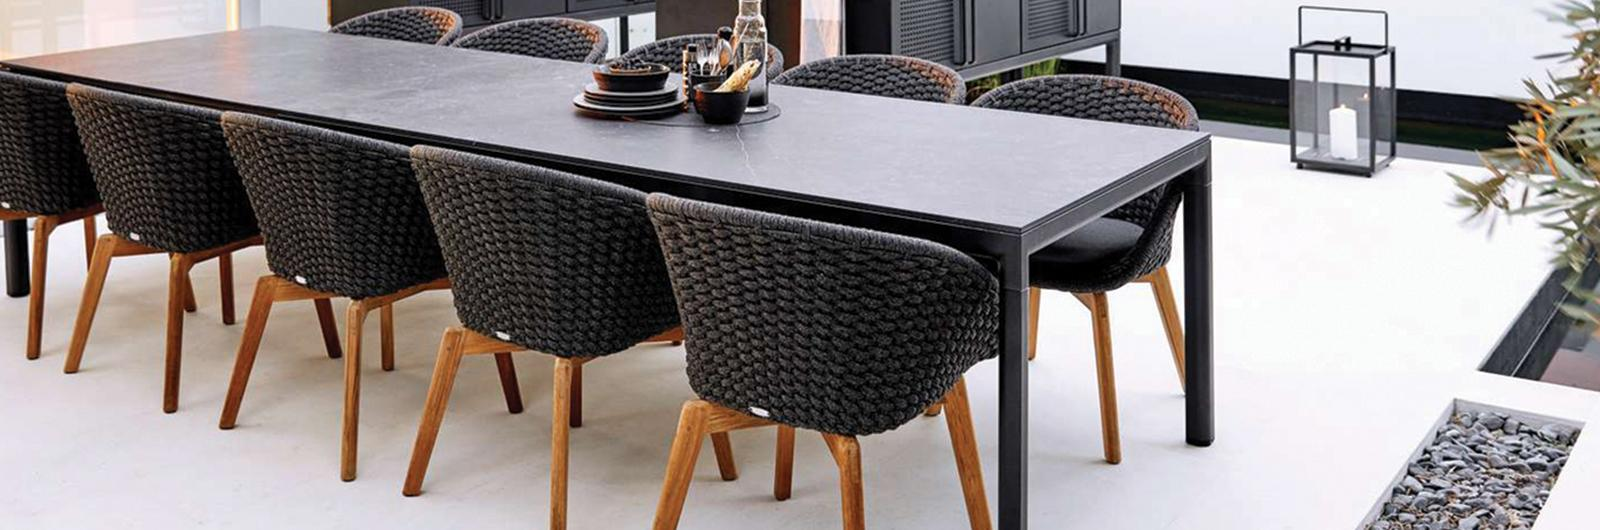 Super Didriks Outdoor Furniture Dinnerware And Home Beutiful Home Inspiration Truamahrainfo